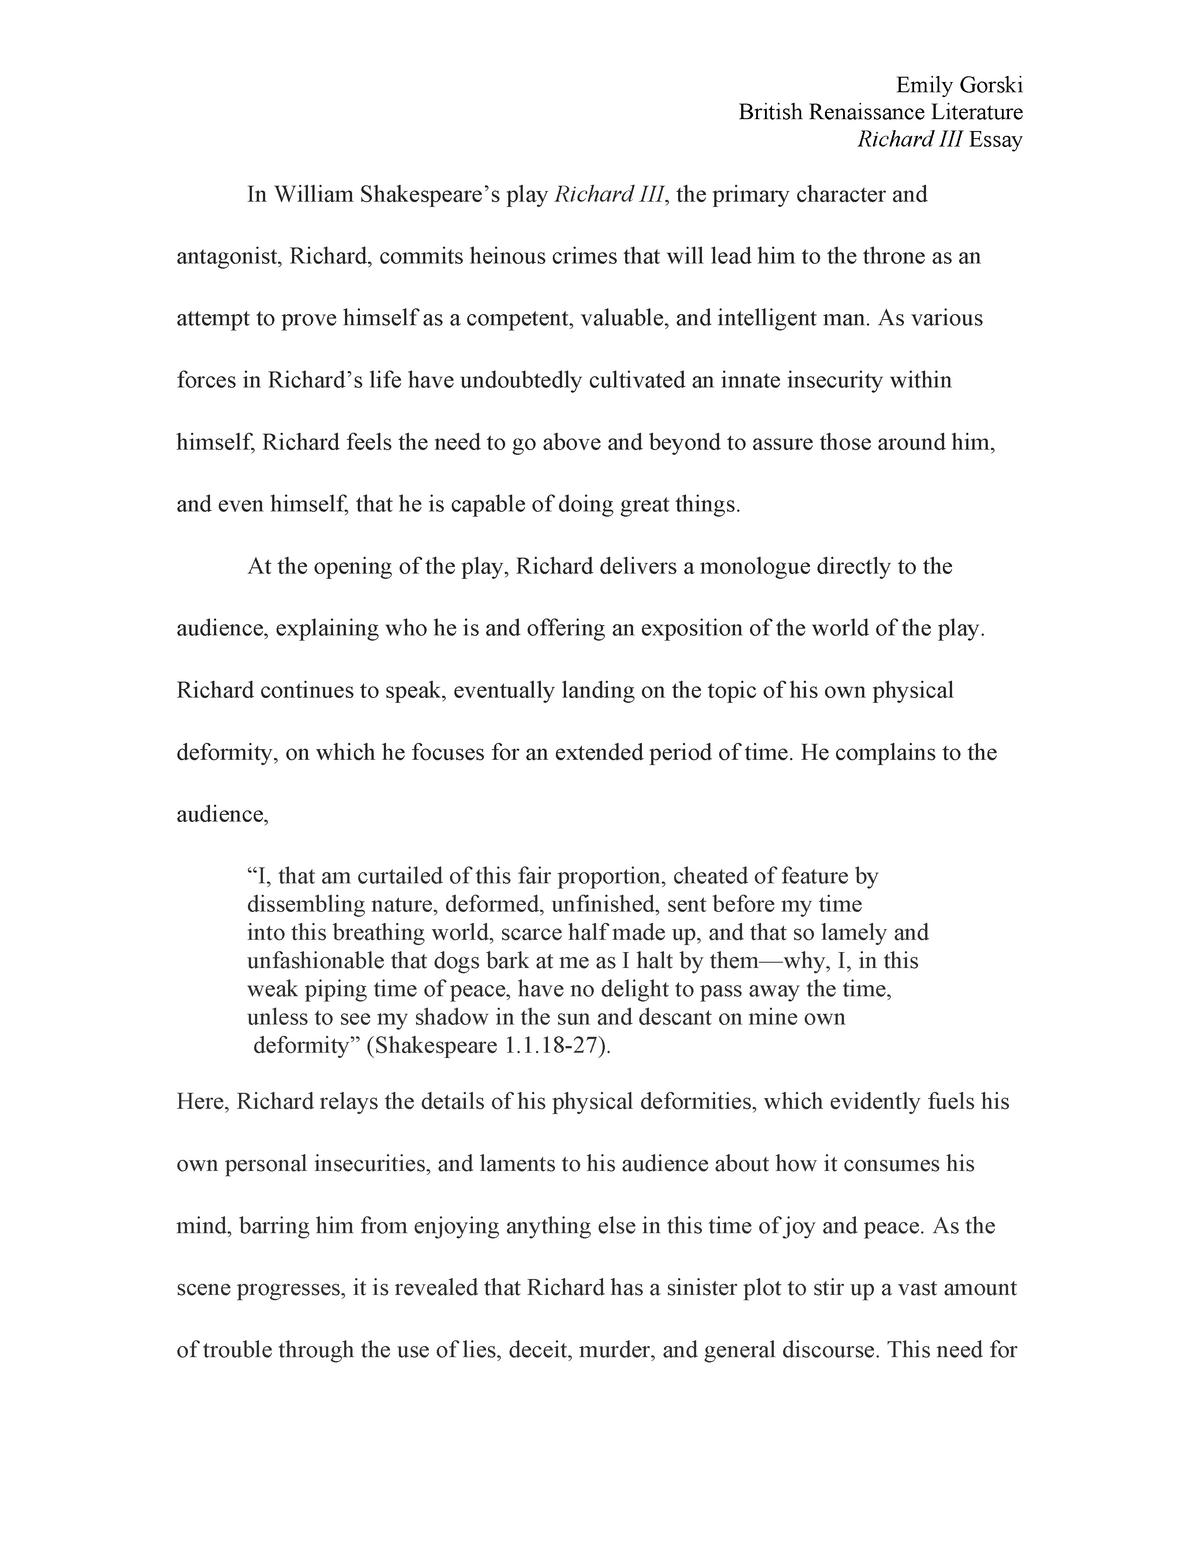 richard the rd essay   grade b   eng  english renaissance  richard the rd essay   grade b   eng  english renaissance literature    studocu